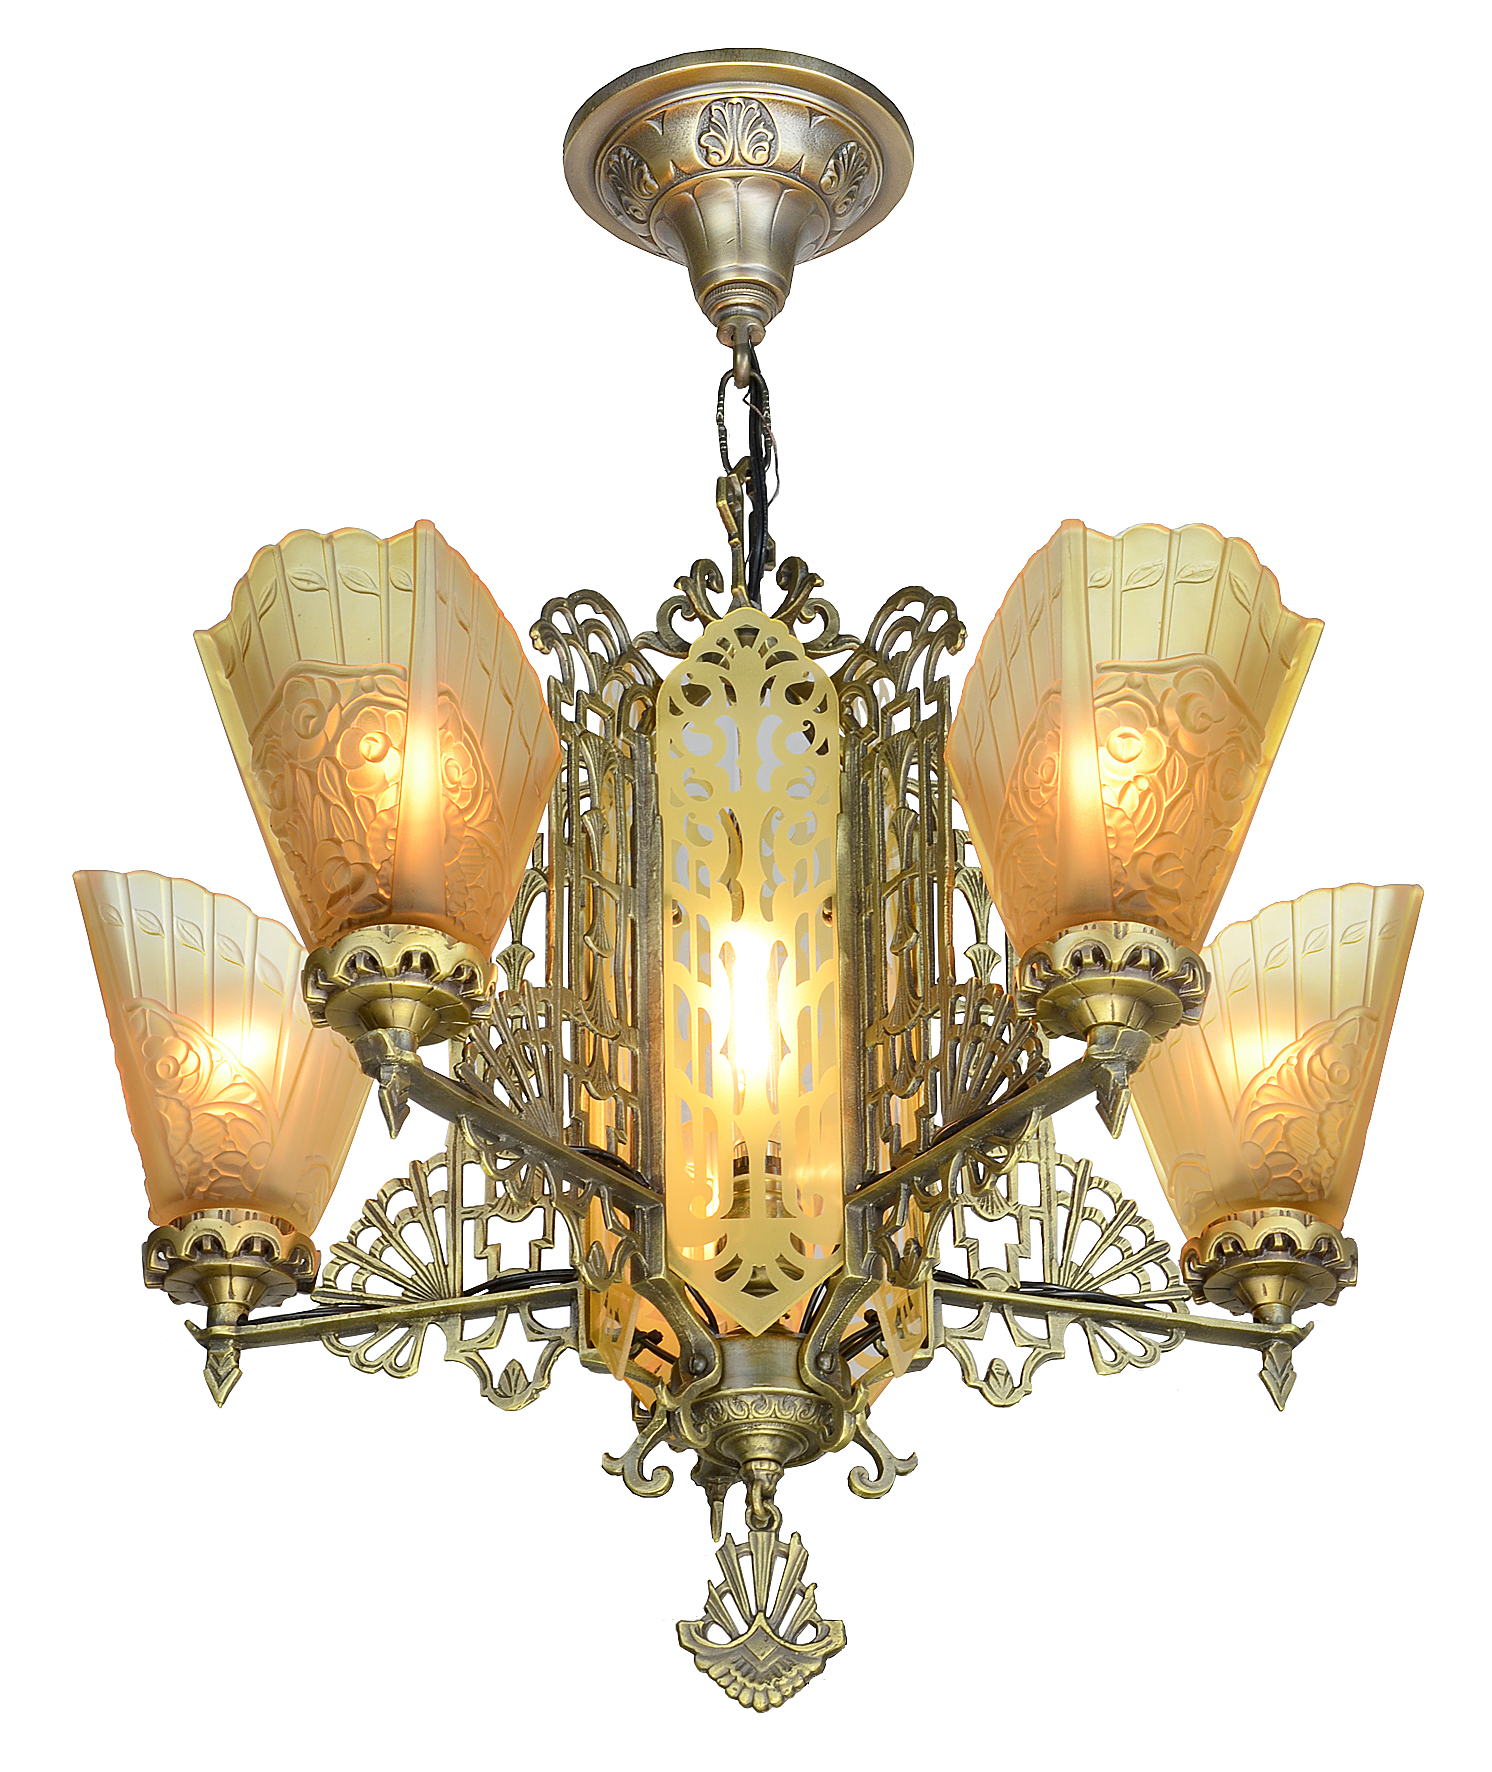 Vintage hardware lighting art deco slip shade chandelier with mgctlbxnmzp mgctlbxv5111 mgctlbxlc arubaitofo Choice Image